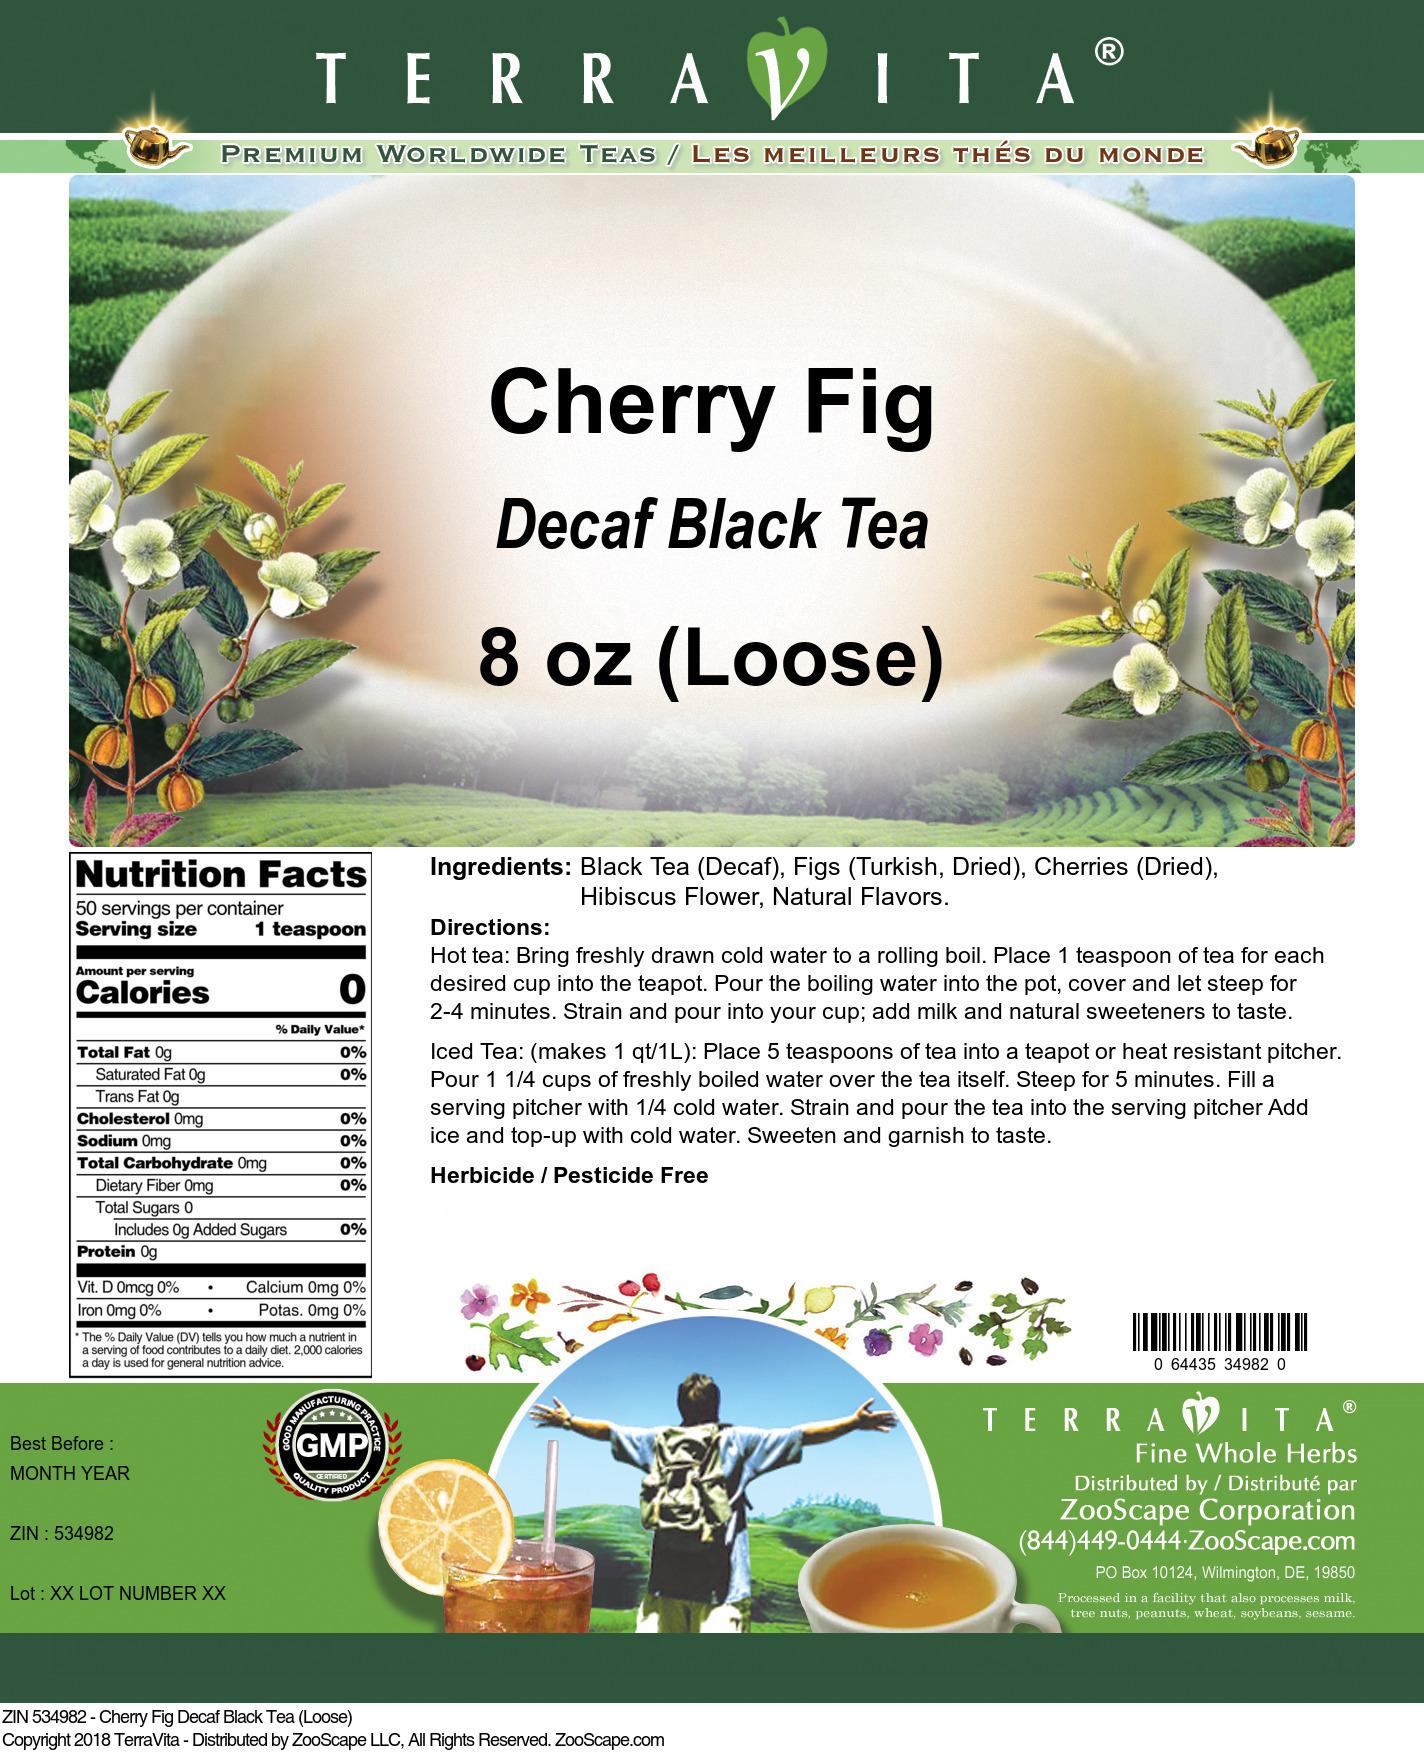 Cherry Fig Decaf Black Tea